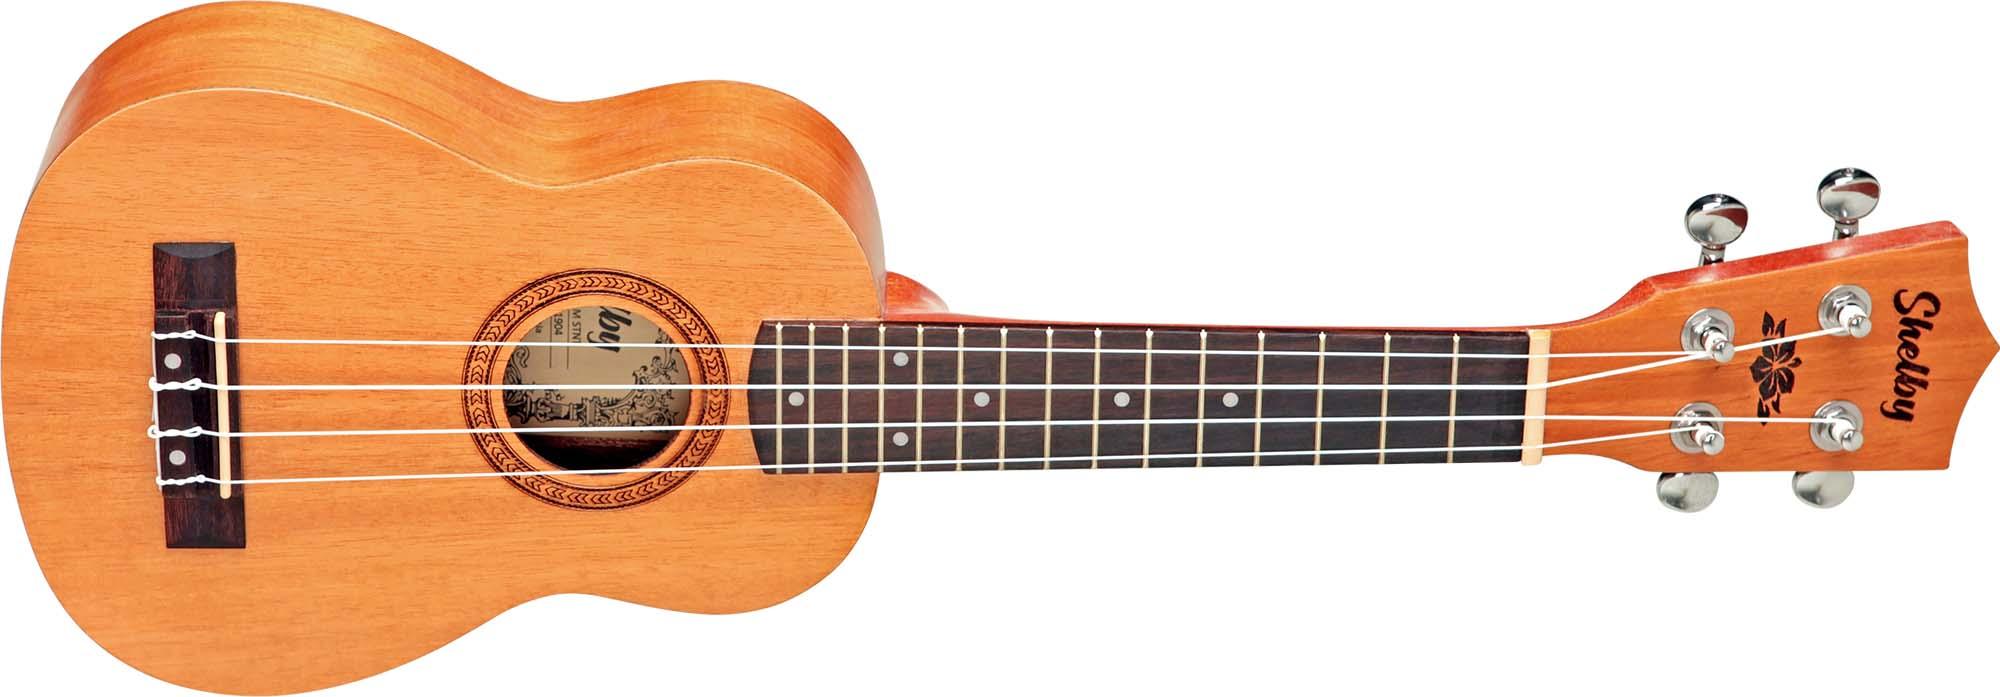 su21m ukulele soprano shelby su21m stnt mogno acetinado visao frontal